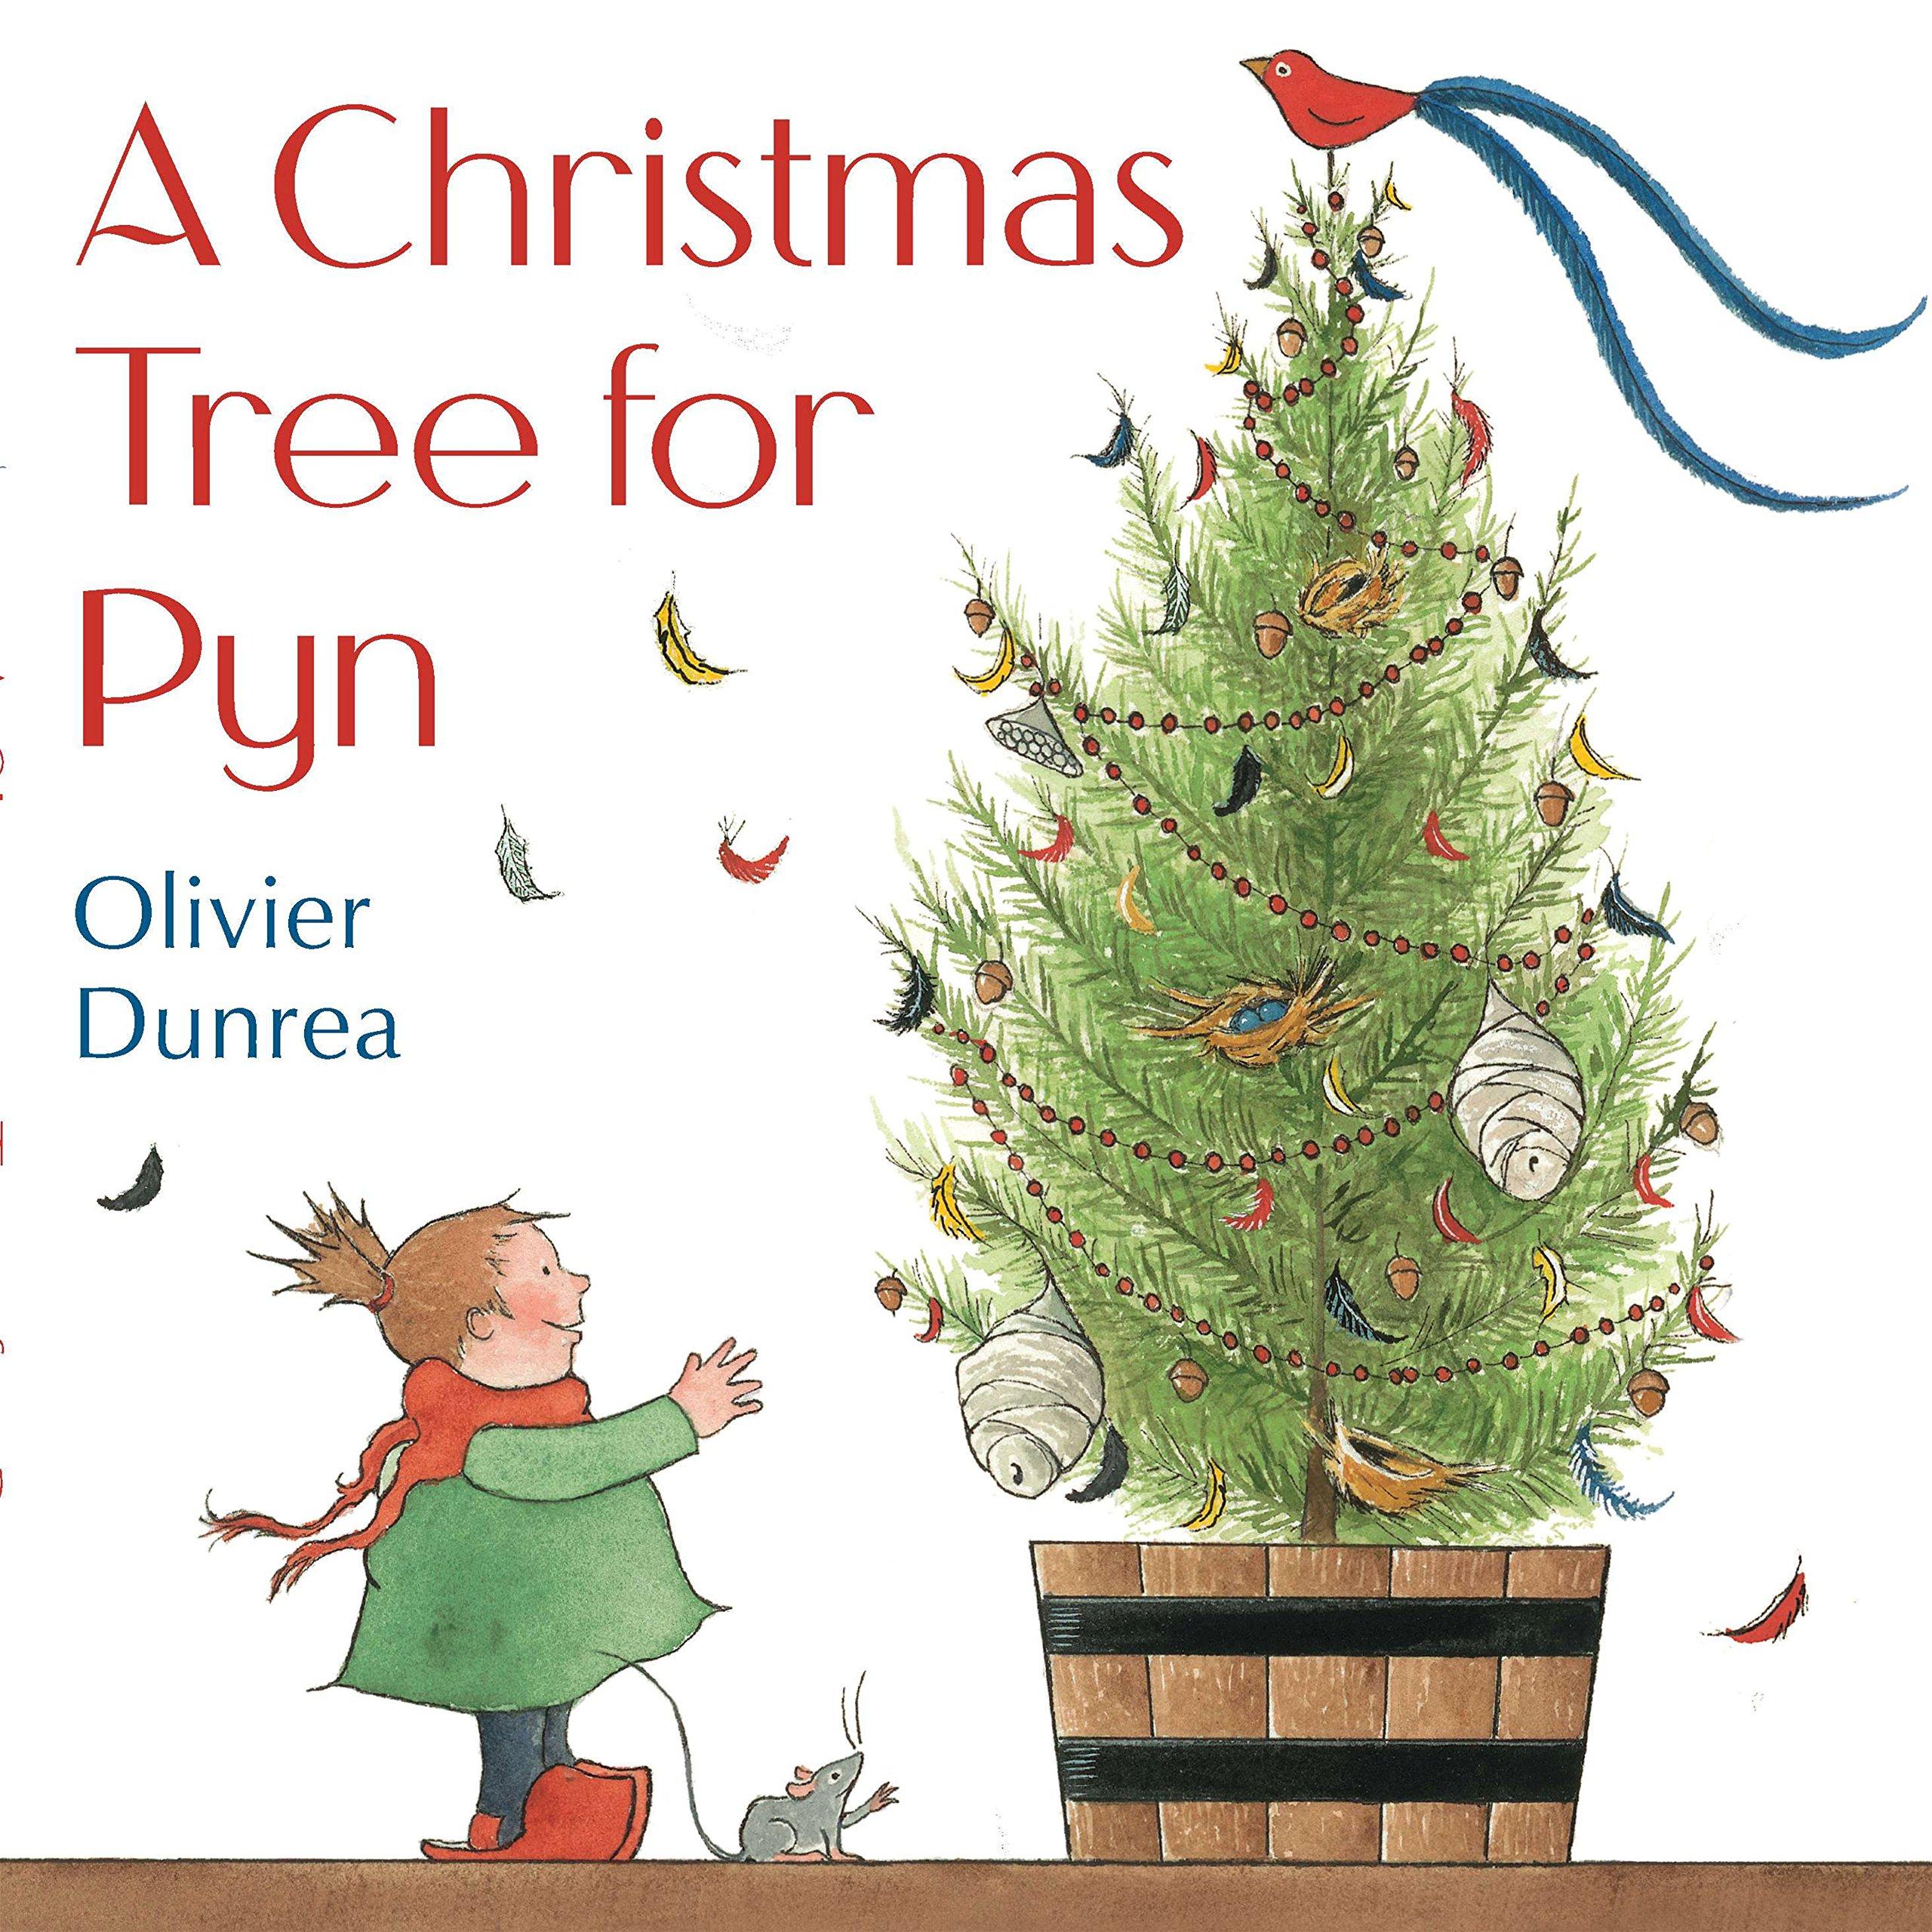 A Christmas Tree for Pyn: Olivier Dunrea: 9780399245060: Amazon.com ...